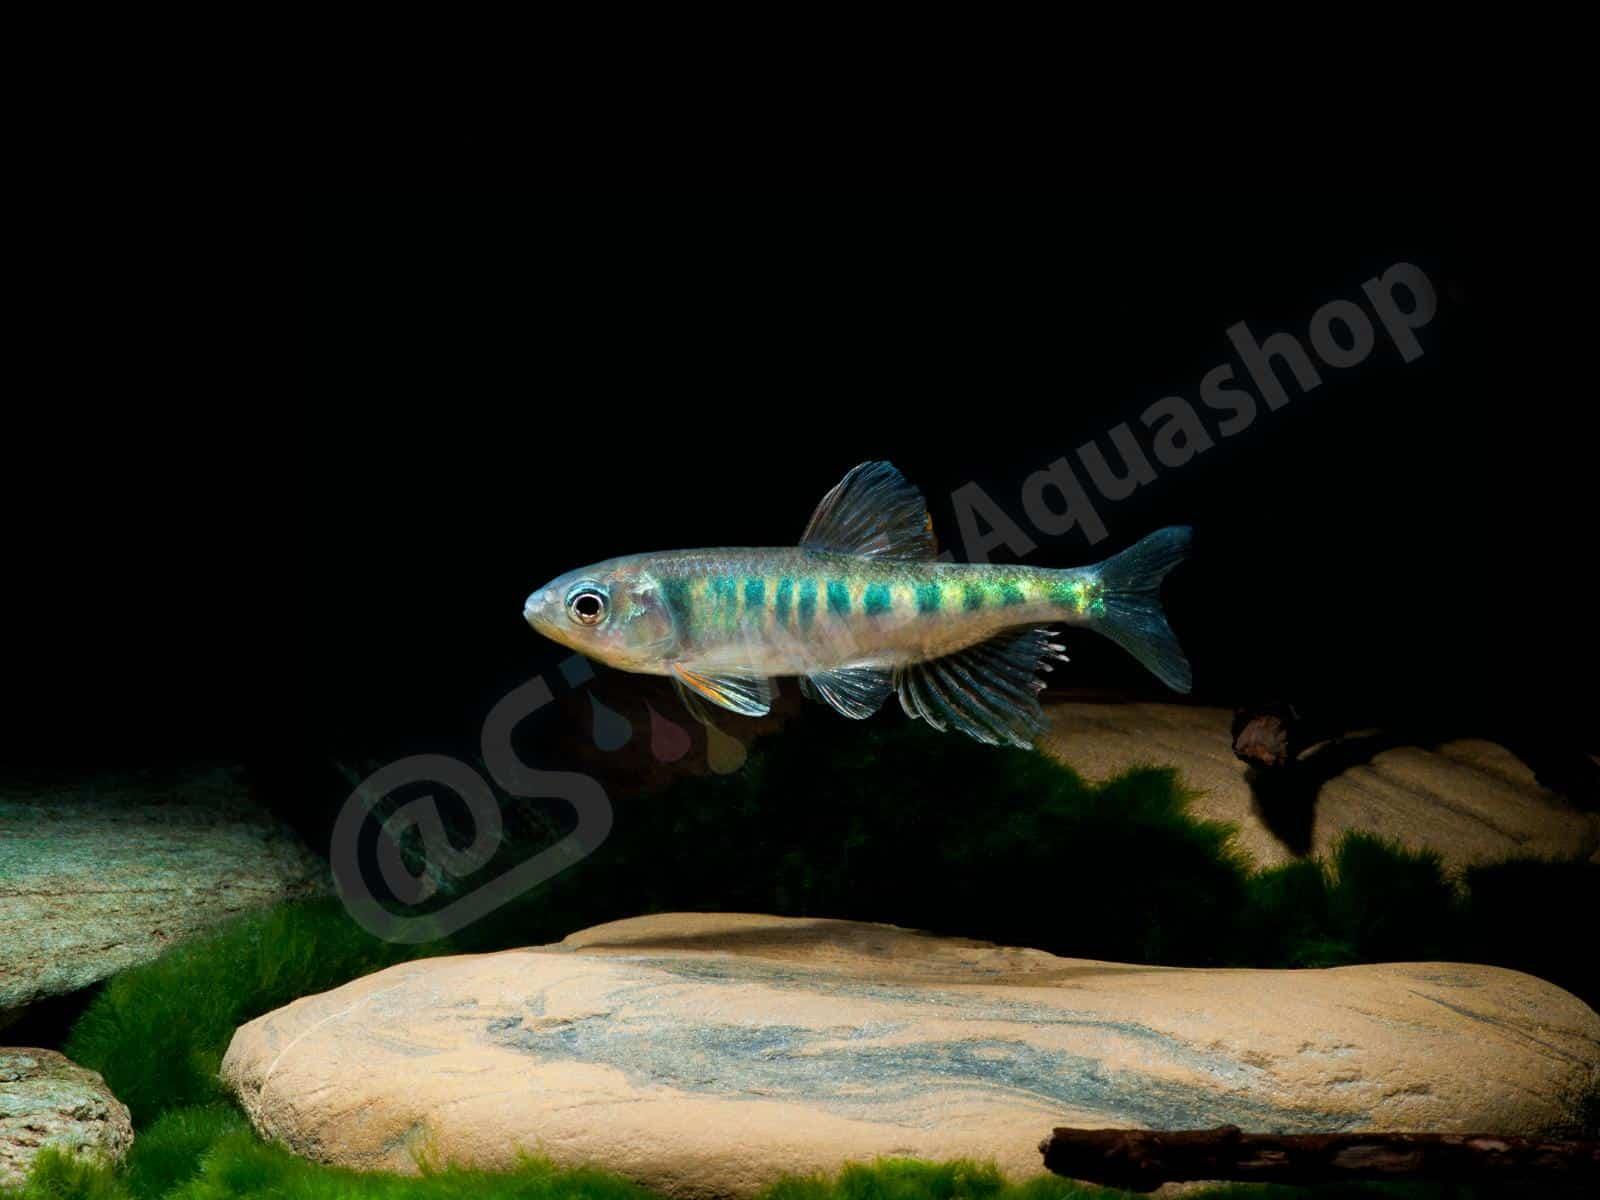 opsarius pulchellus enrico richter 0324 6